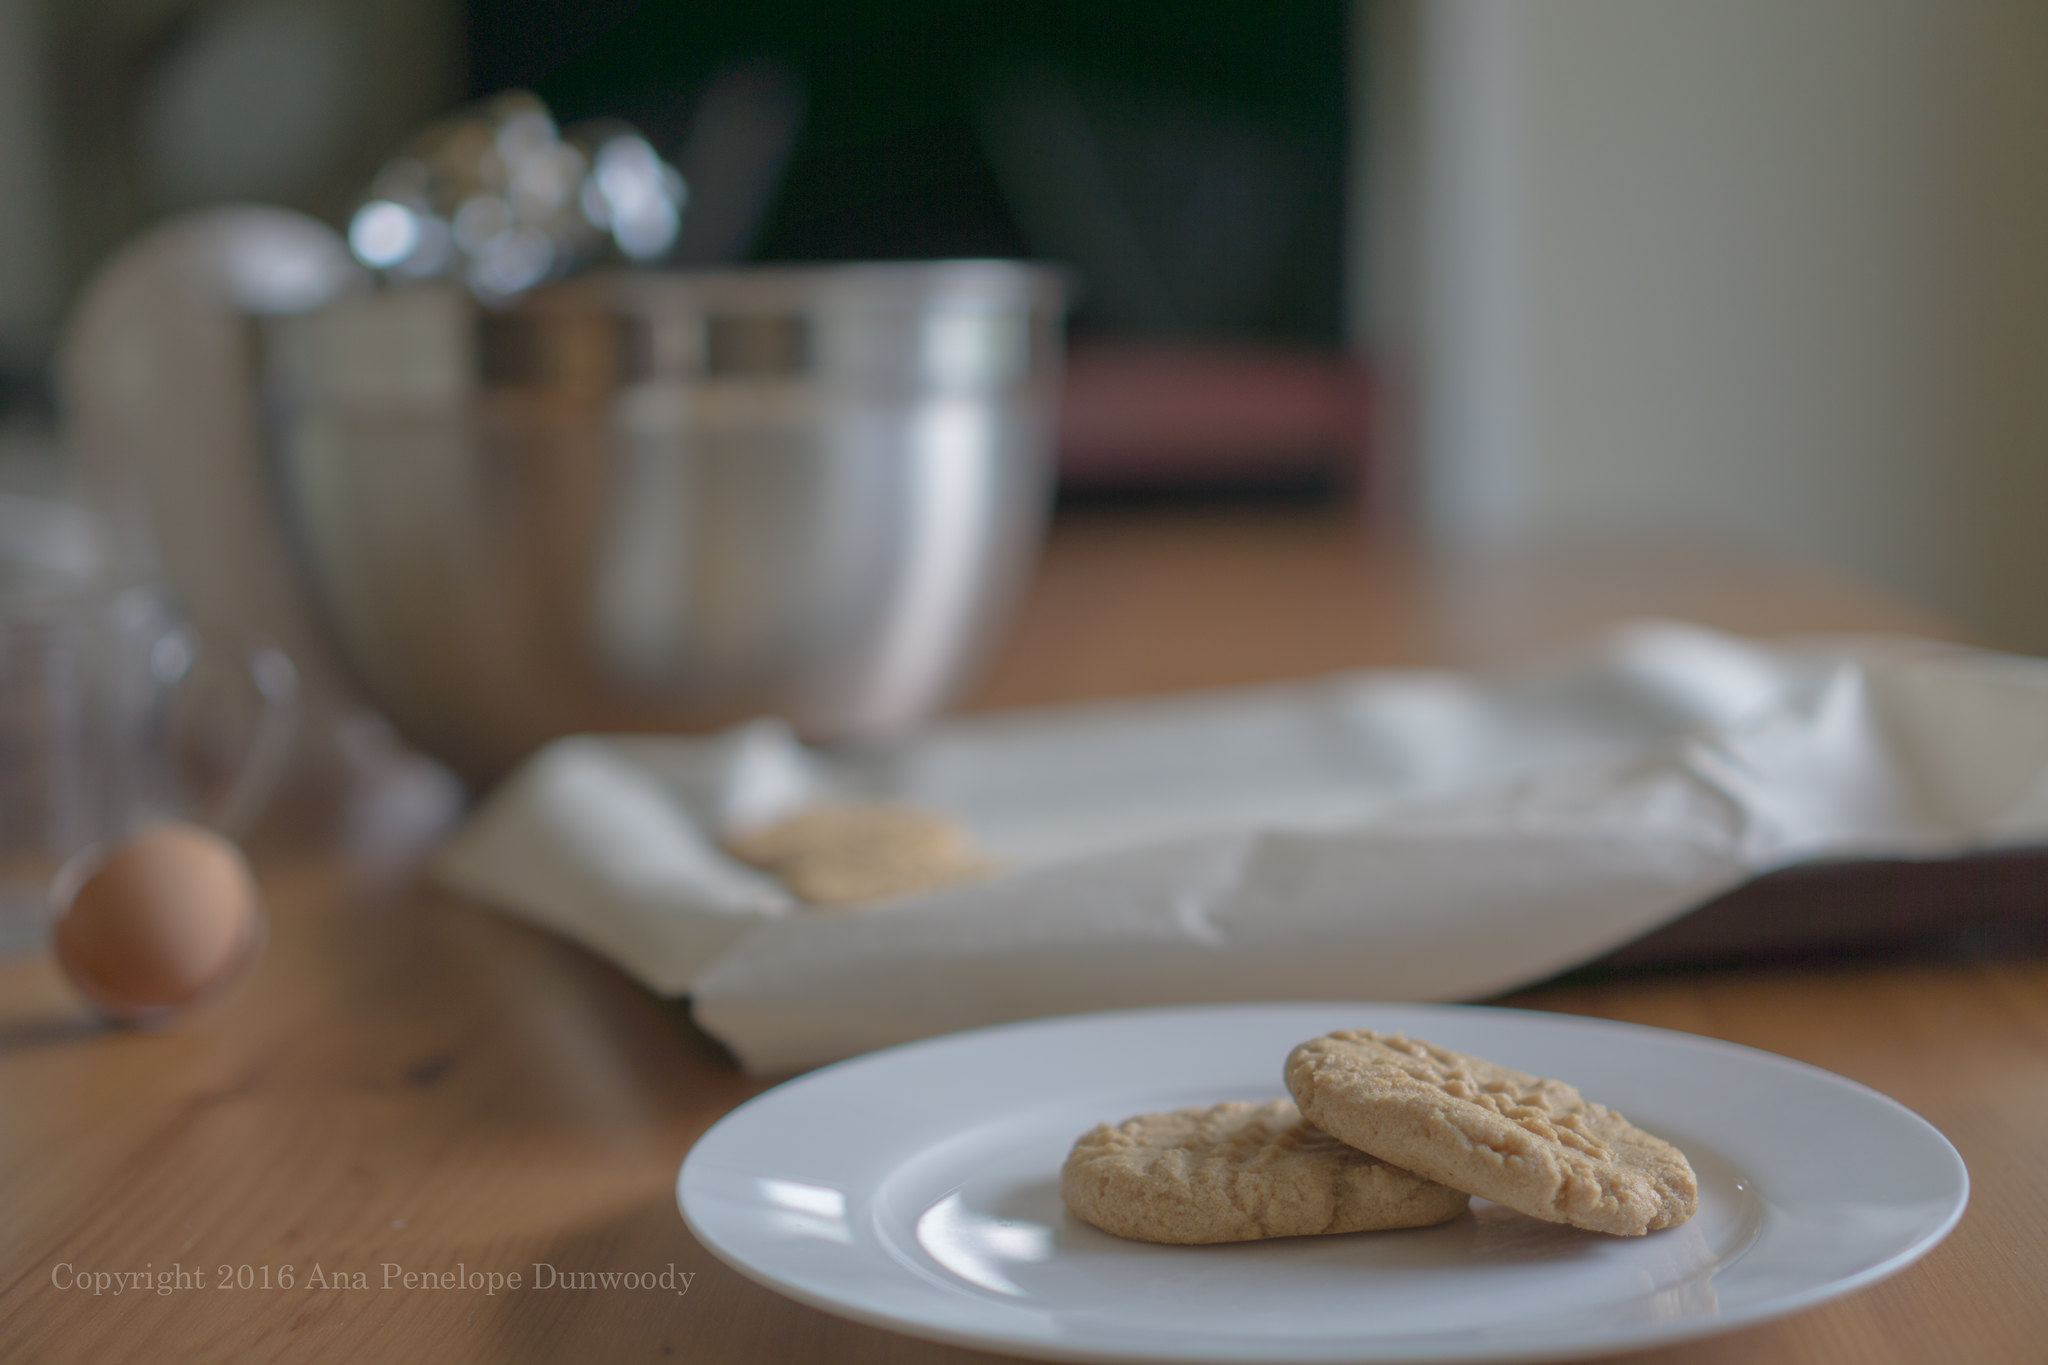 Last Peanut Butter Cookie Picture